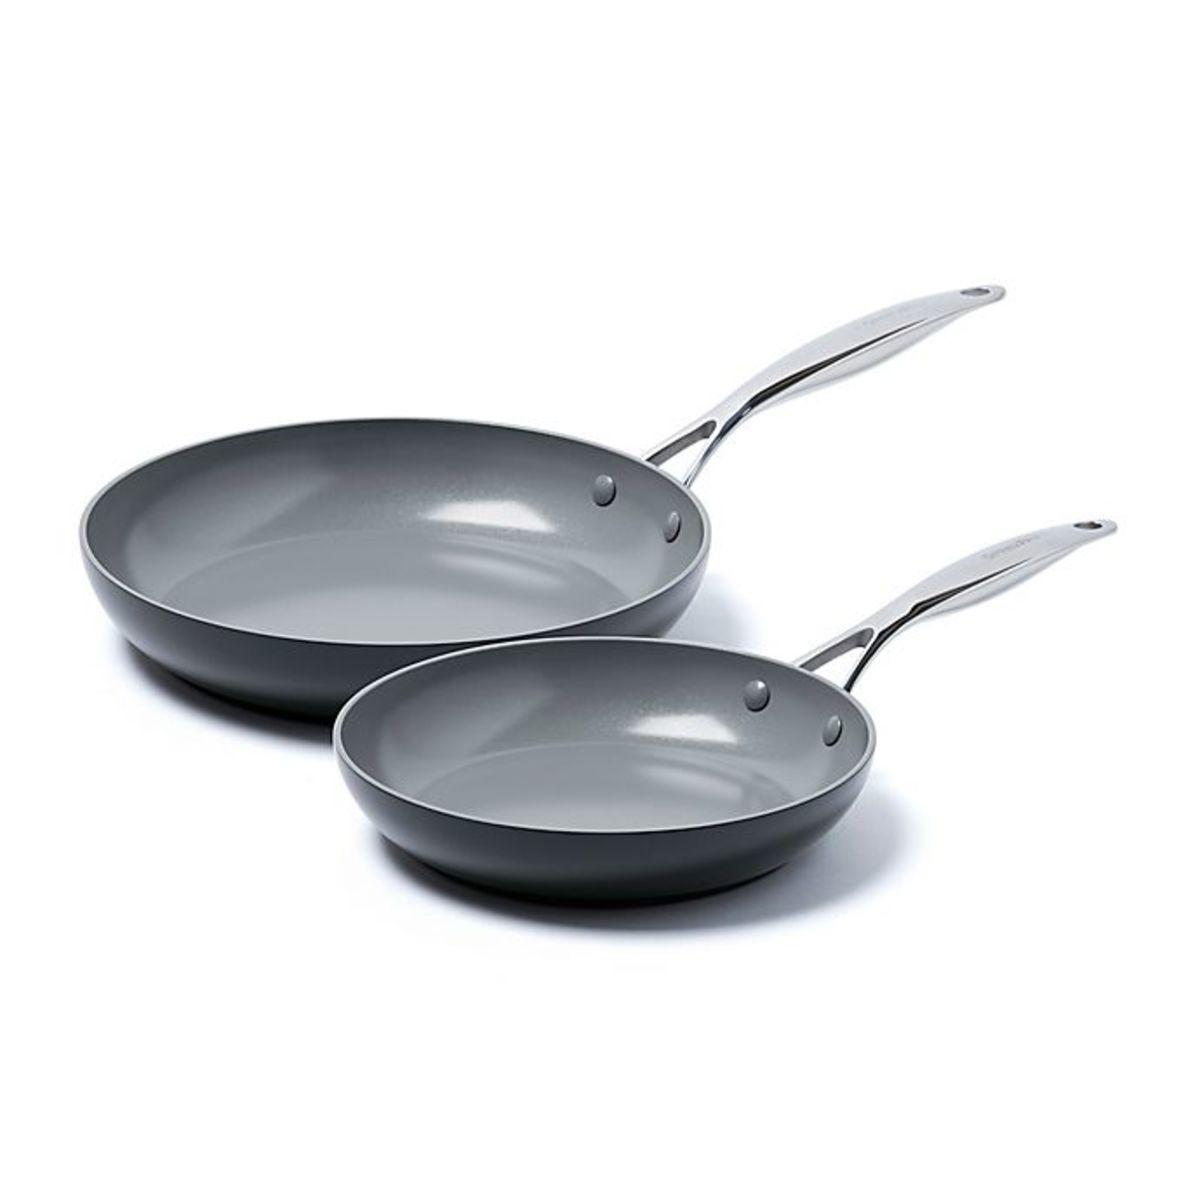 ceramic-nonstick-skillets-ptfe-nonstick-skillets-and-woks-oh-my